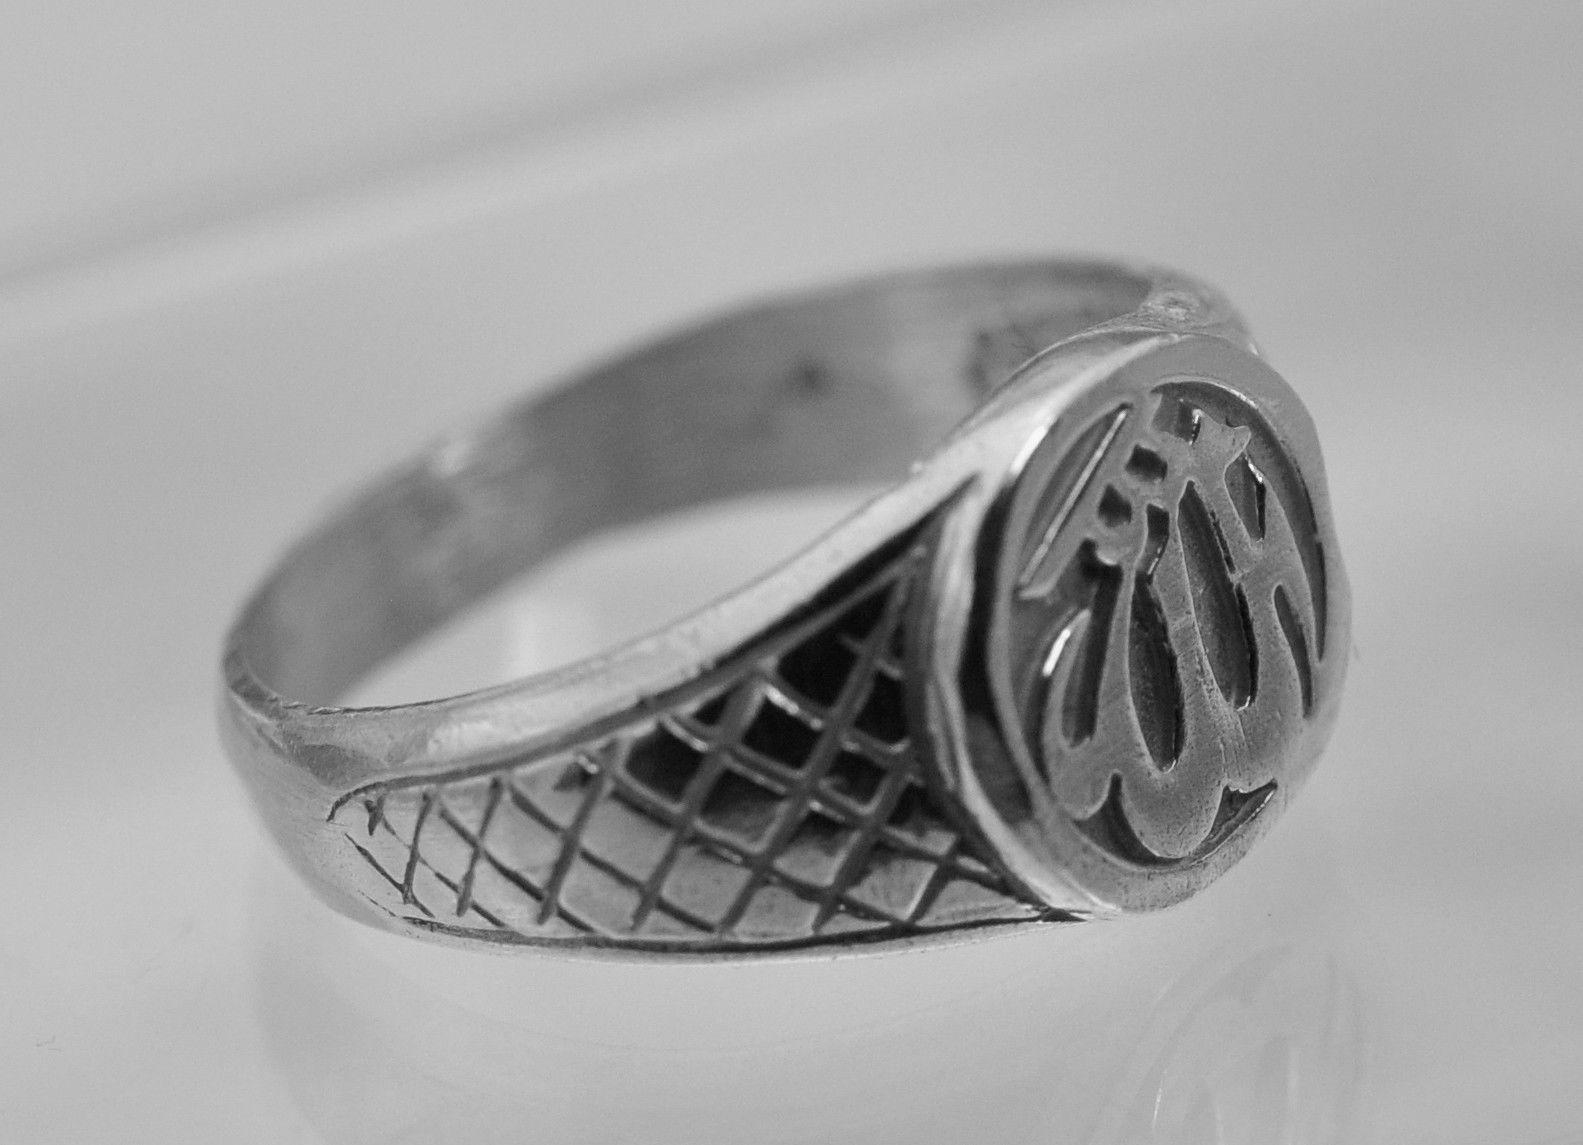 Allah Muslim Islam Ring SAUDI ARABIA Sold Sterling silver 925 Jewelry Islamic